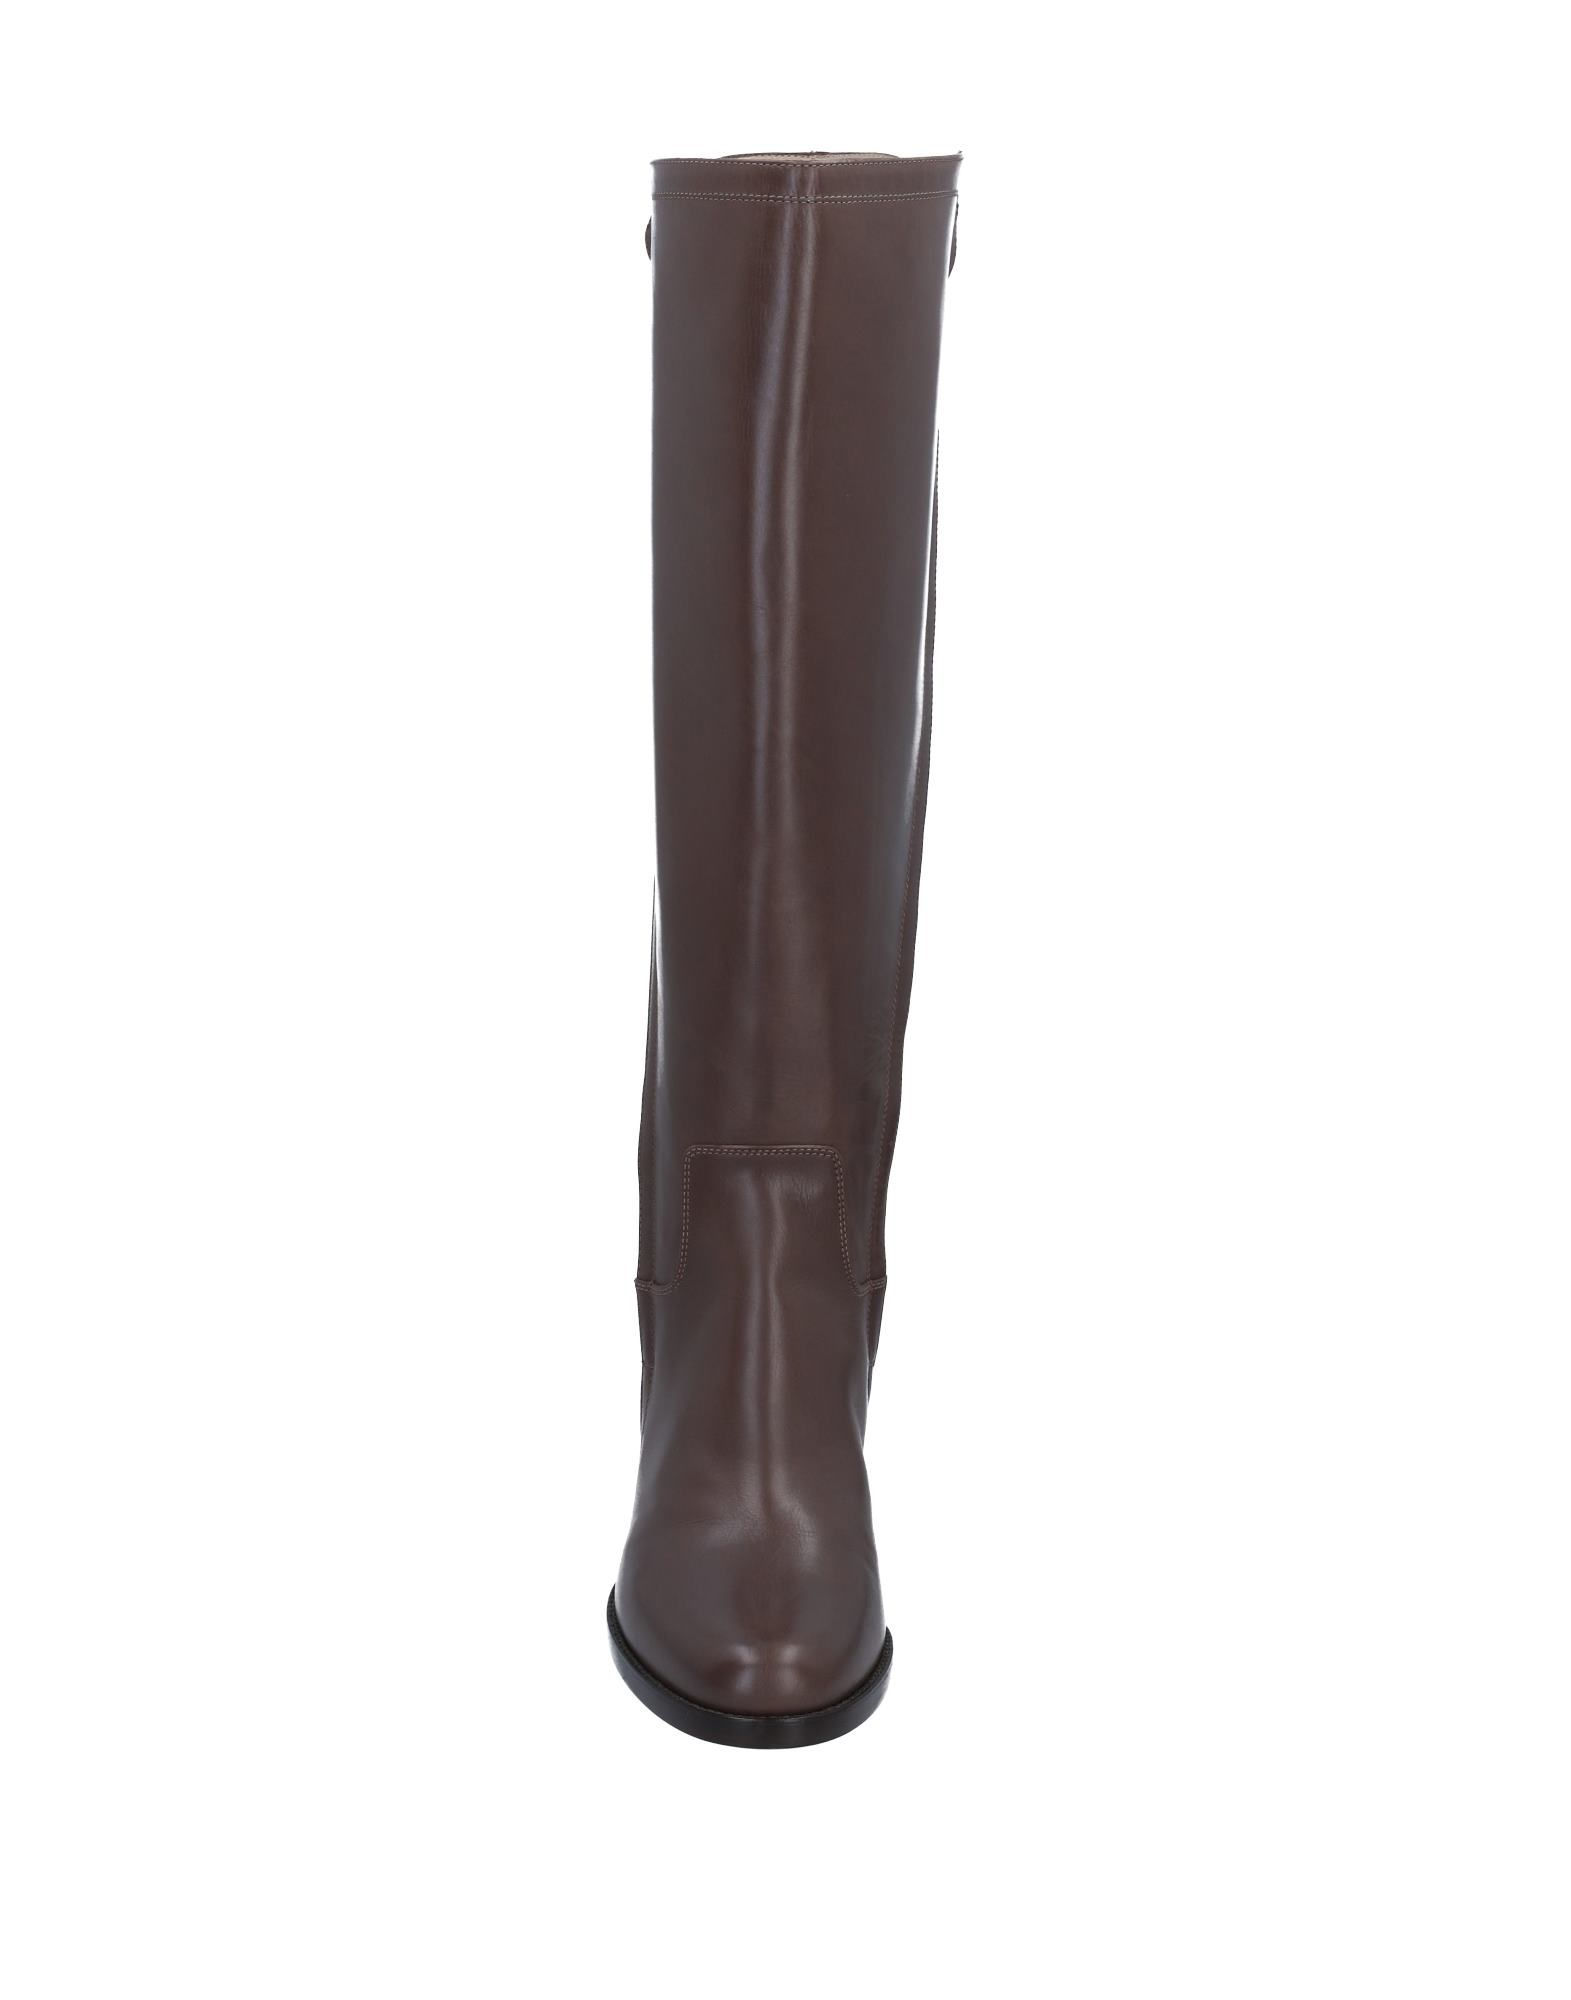 Stilvolle Stiefel billige Schuhe Norma J.Baker Stiefel Stilvolle Damen  11516404RR 588869